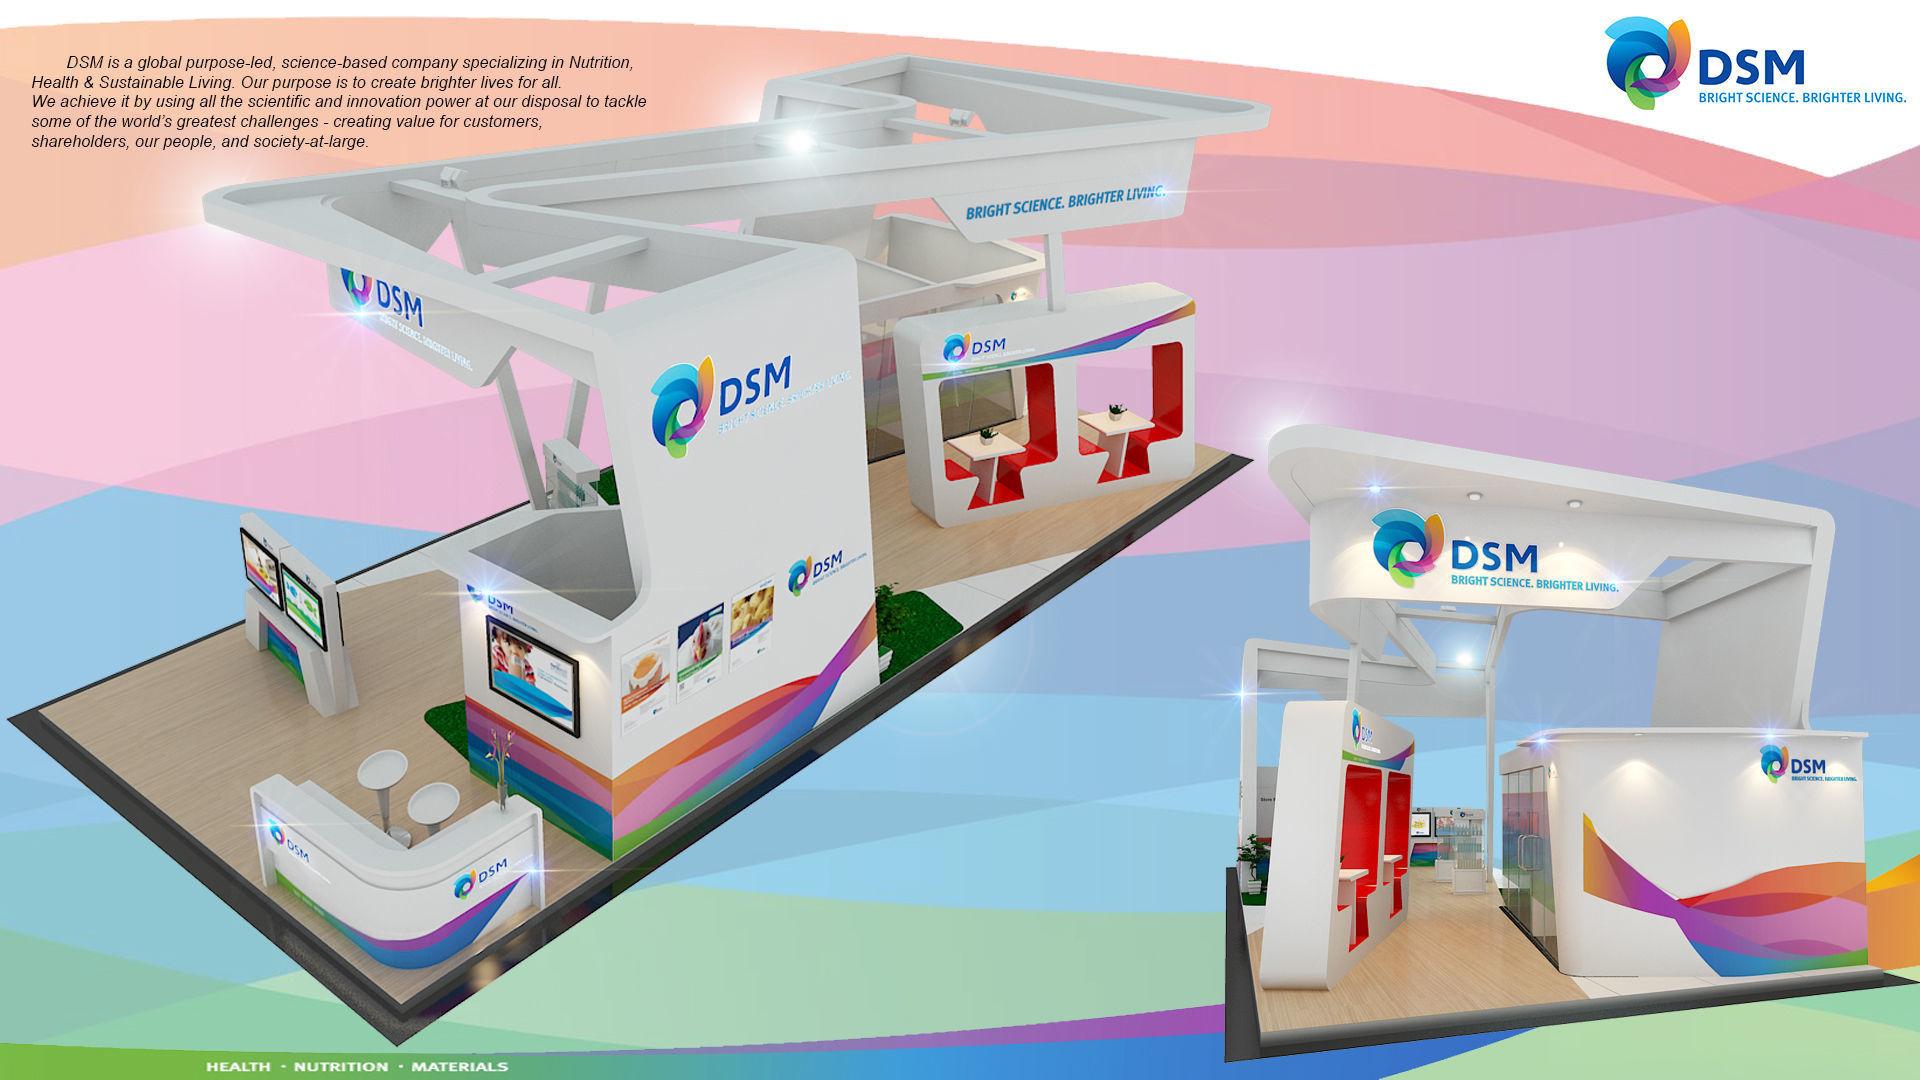 Booth DSM design size 15 x 6 m 90 sqm